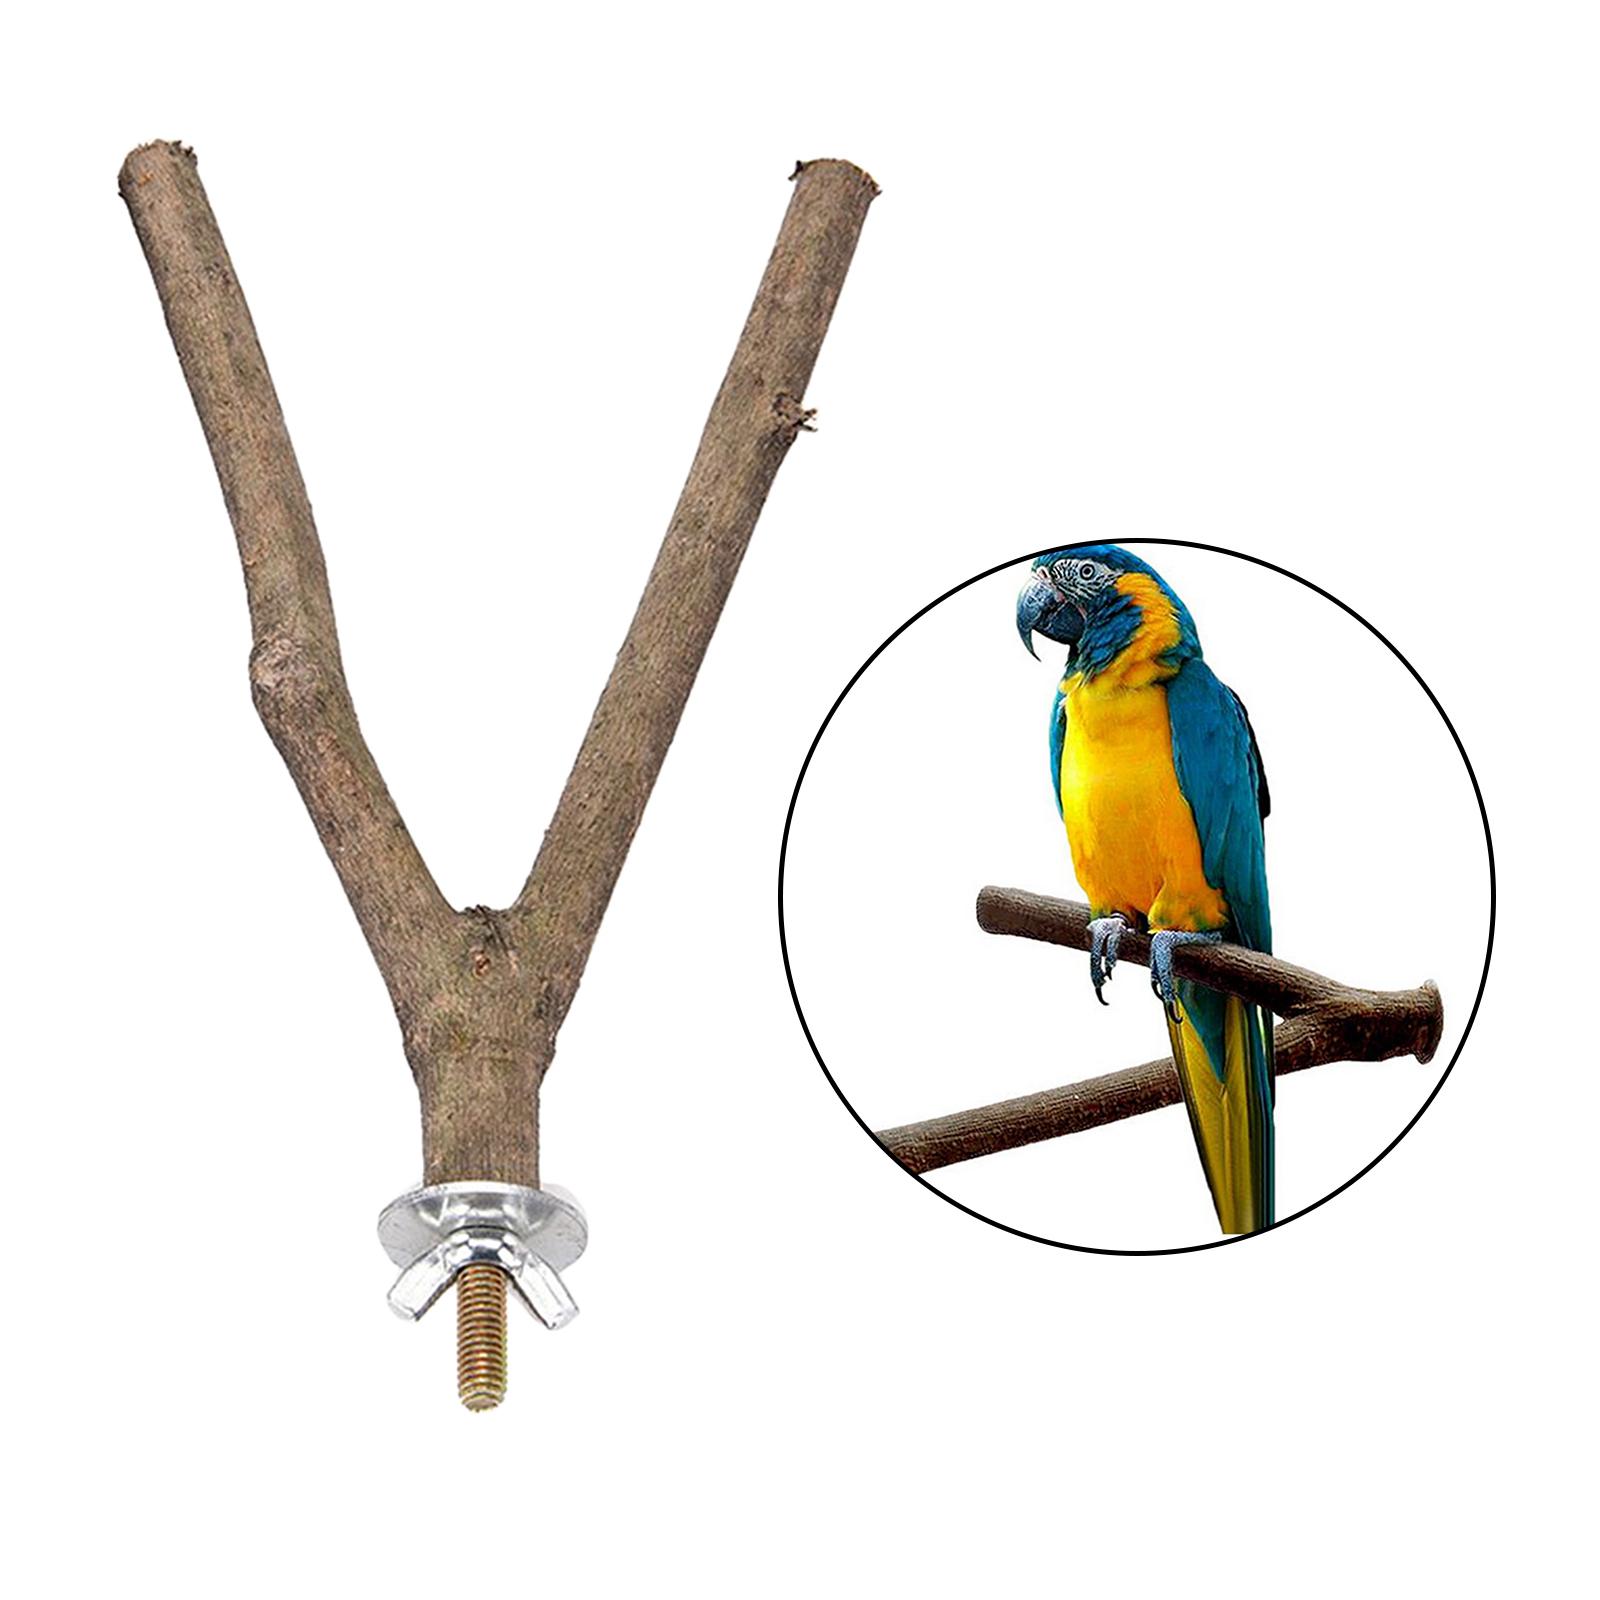 thumbnail 9 - Bird-Perch-Wood-Stand-Bird-Cage-Swing-Branch-for-Parrot-Parakeet-Cockatiel